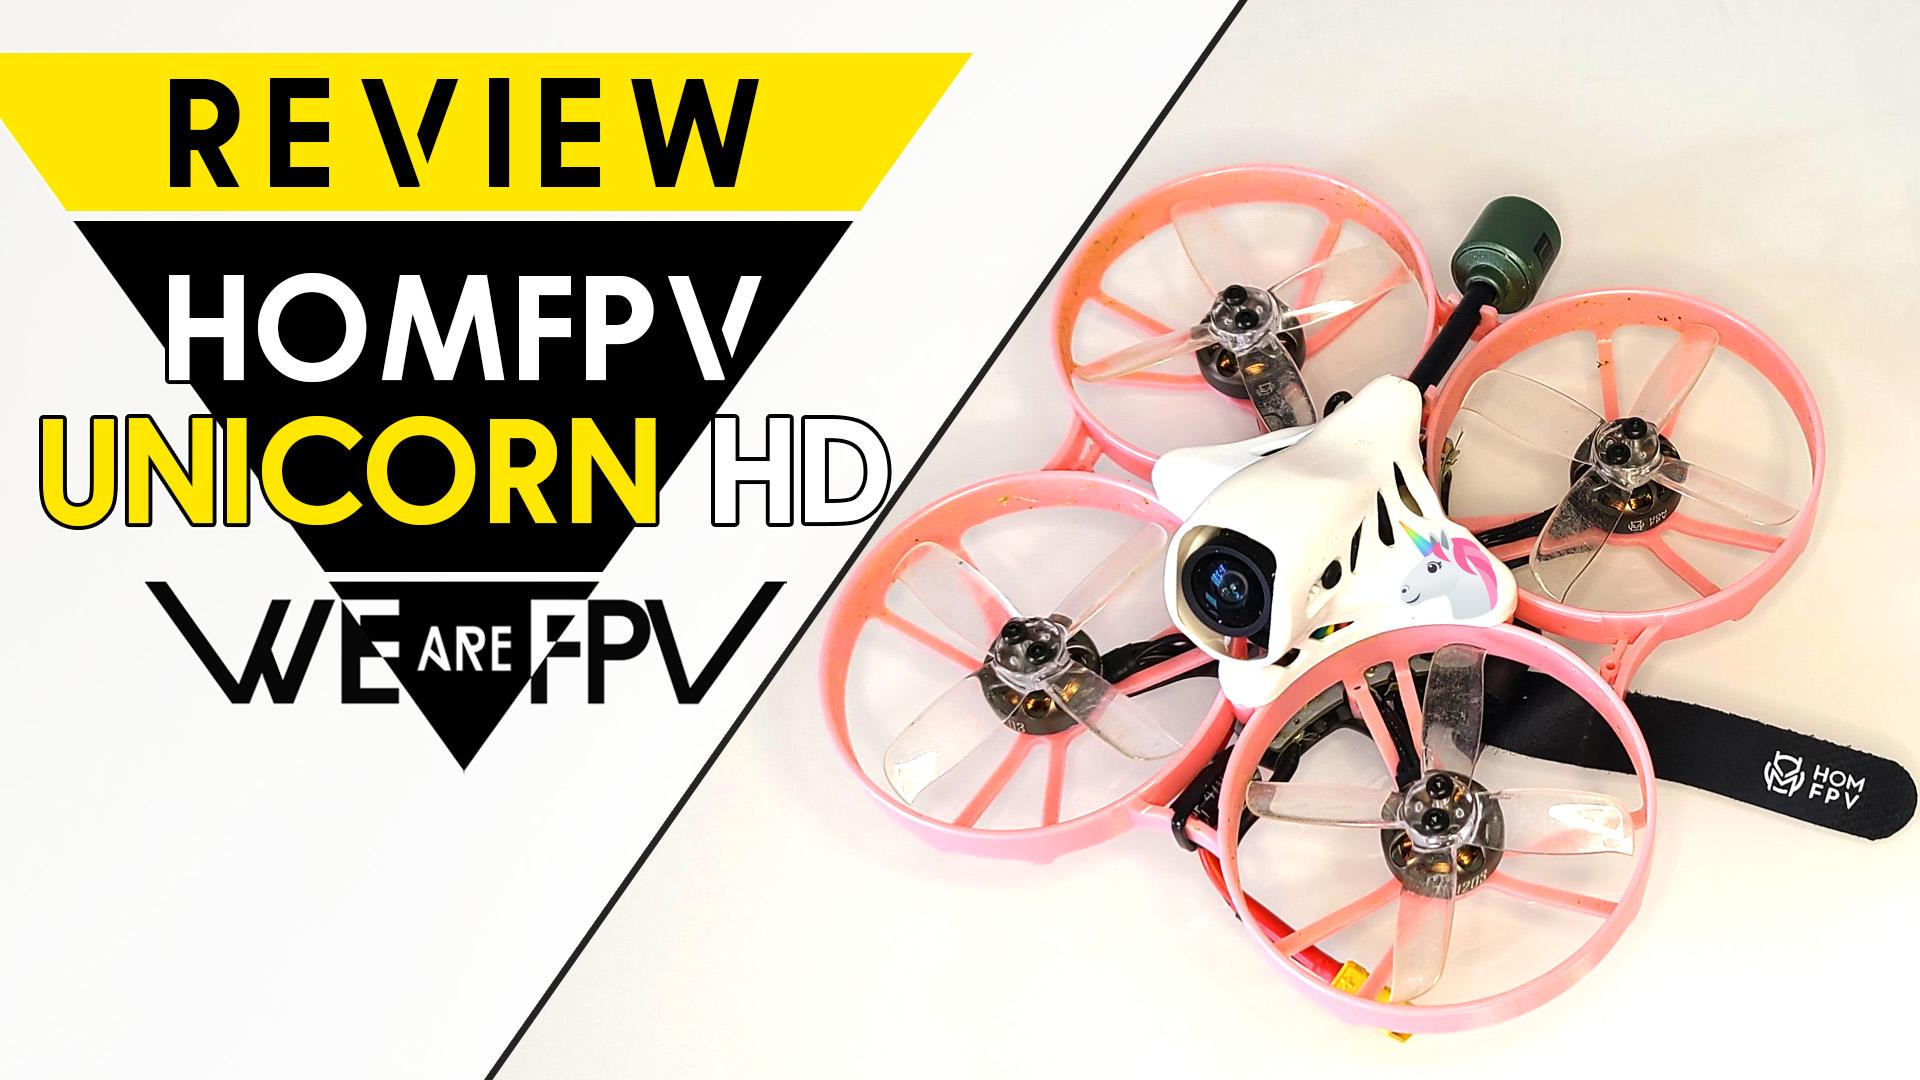 Test HOMFPV Unicorn review